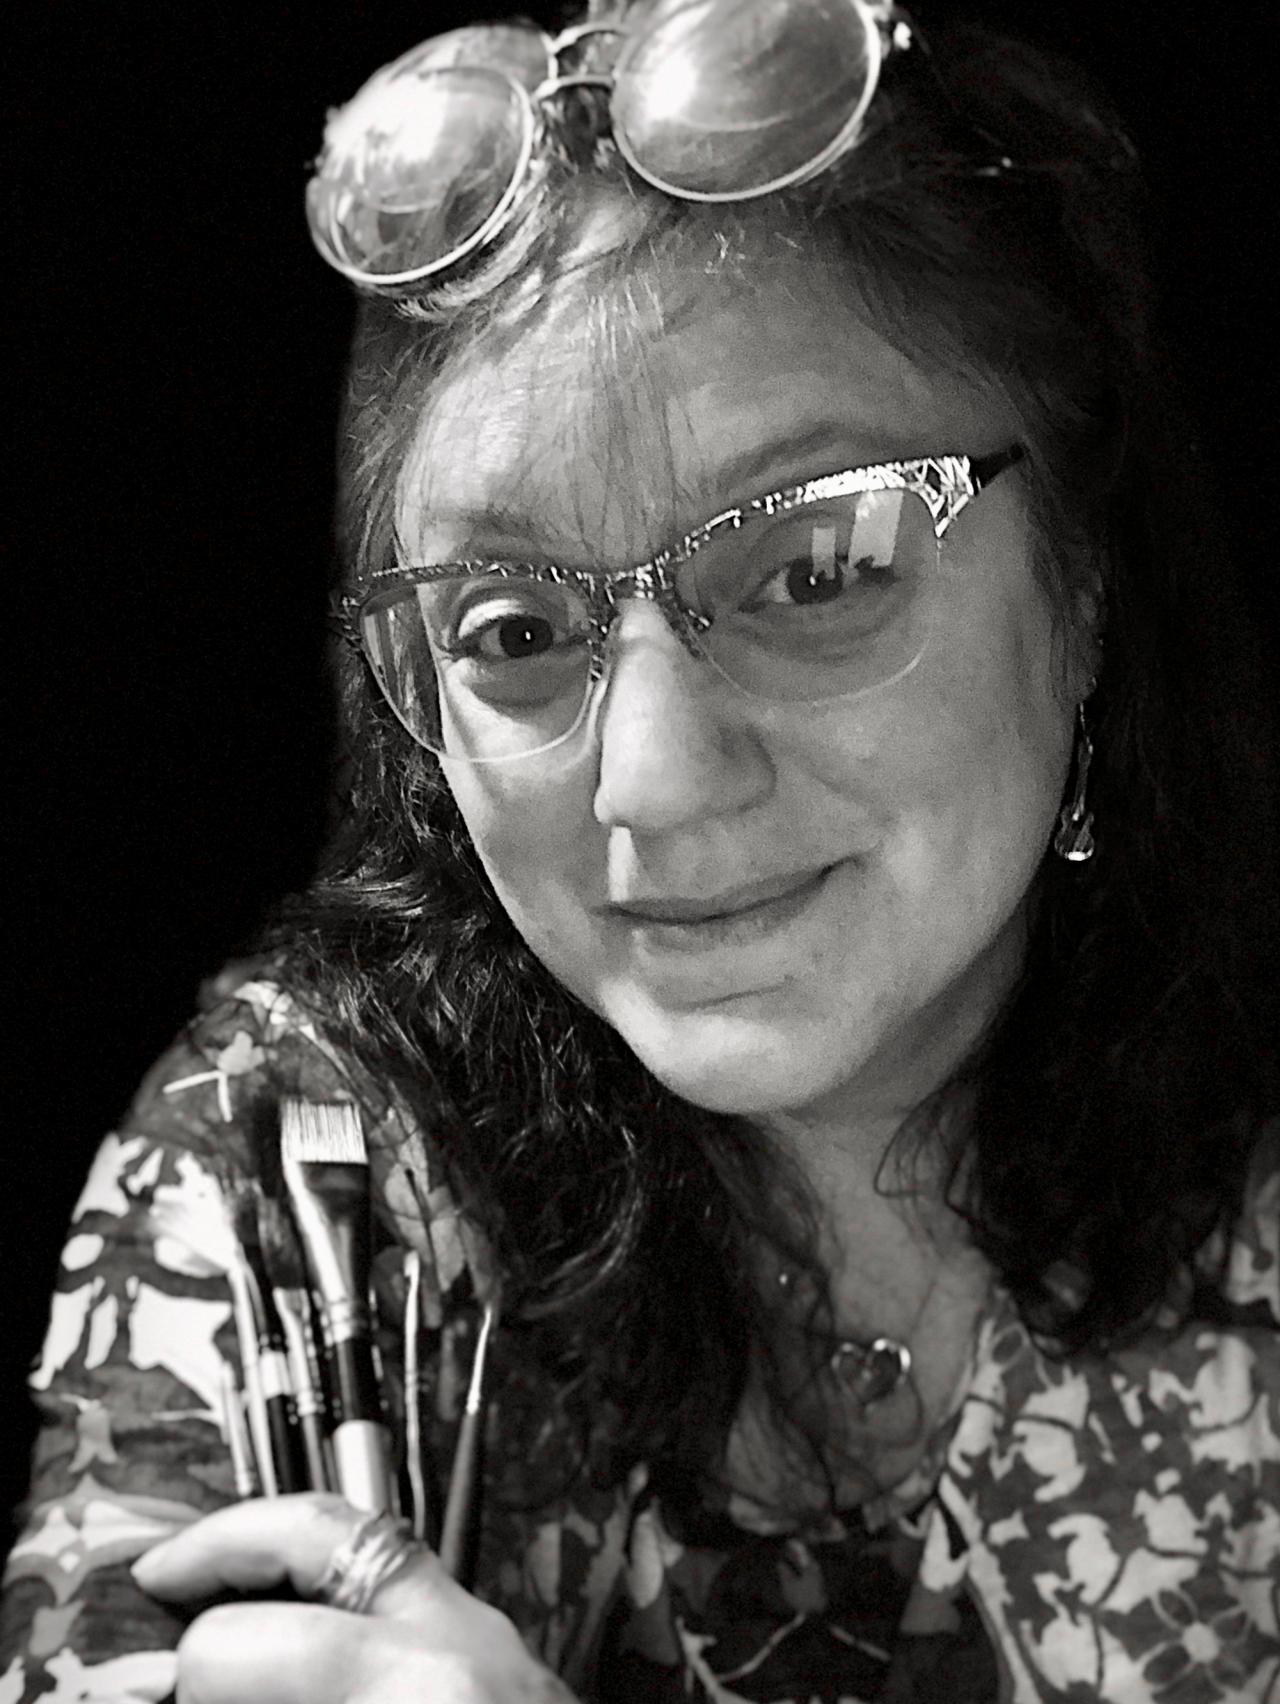 Within Moments, Rev Dr Birdi Sinclair, writer, artist, spiritual counselor